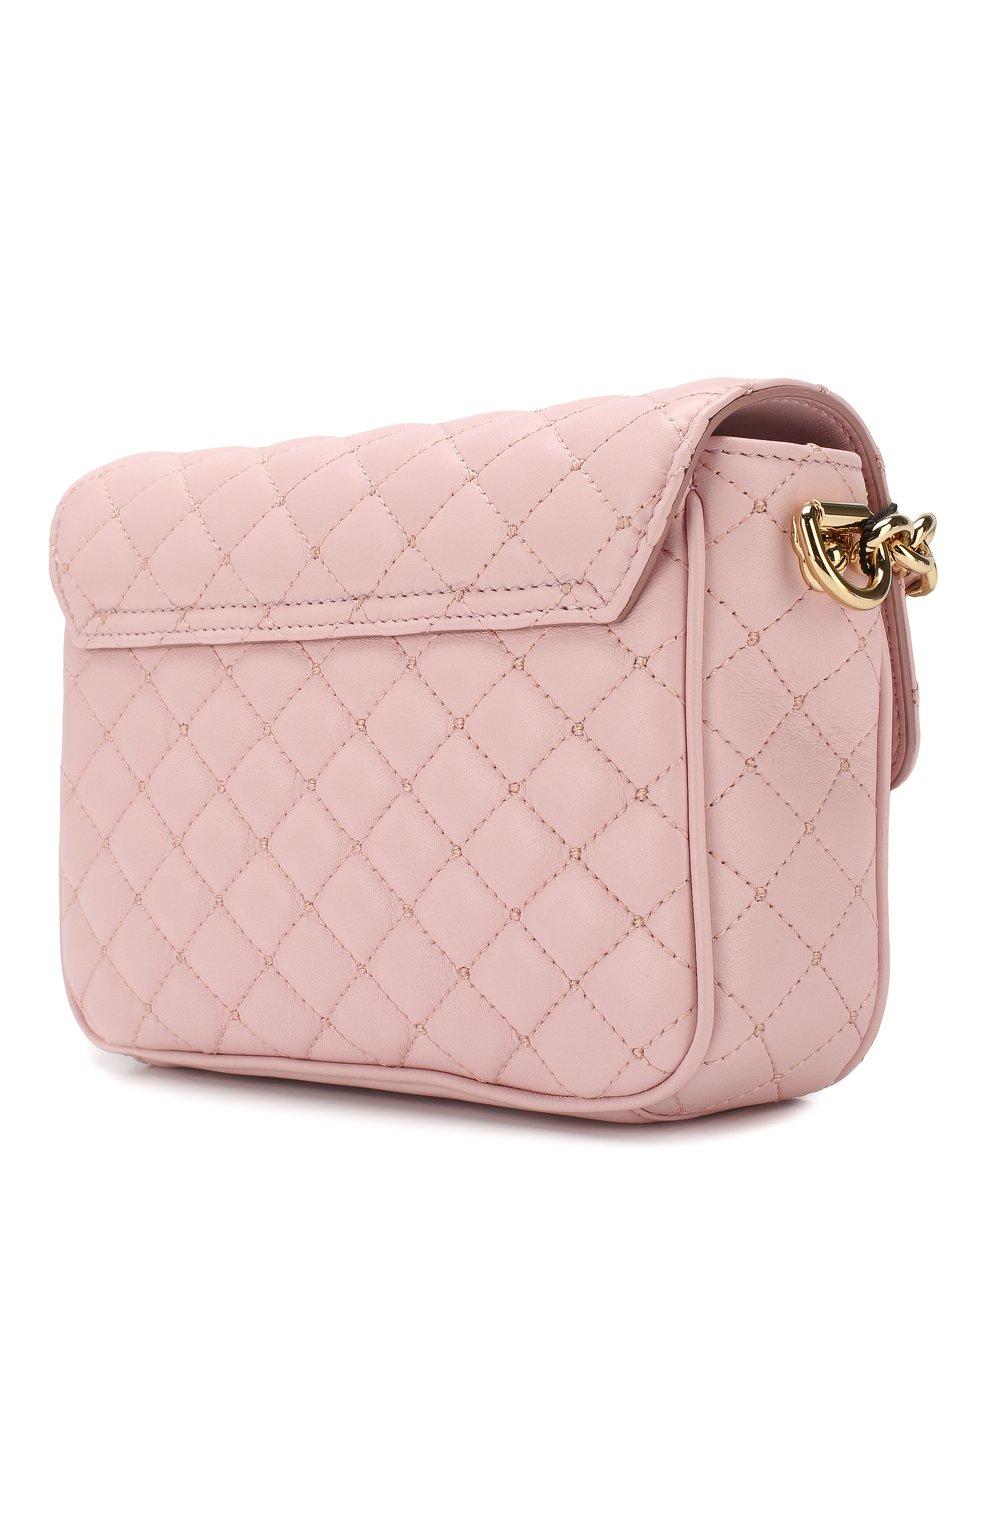 Сумка DG Millennials Dolce & Gabbana светло-розовая цвета   Фото №3